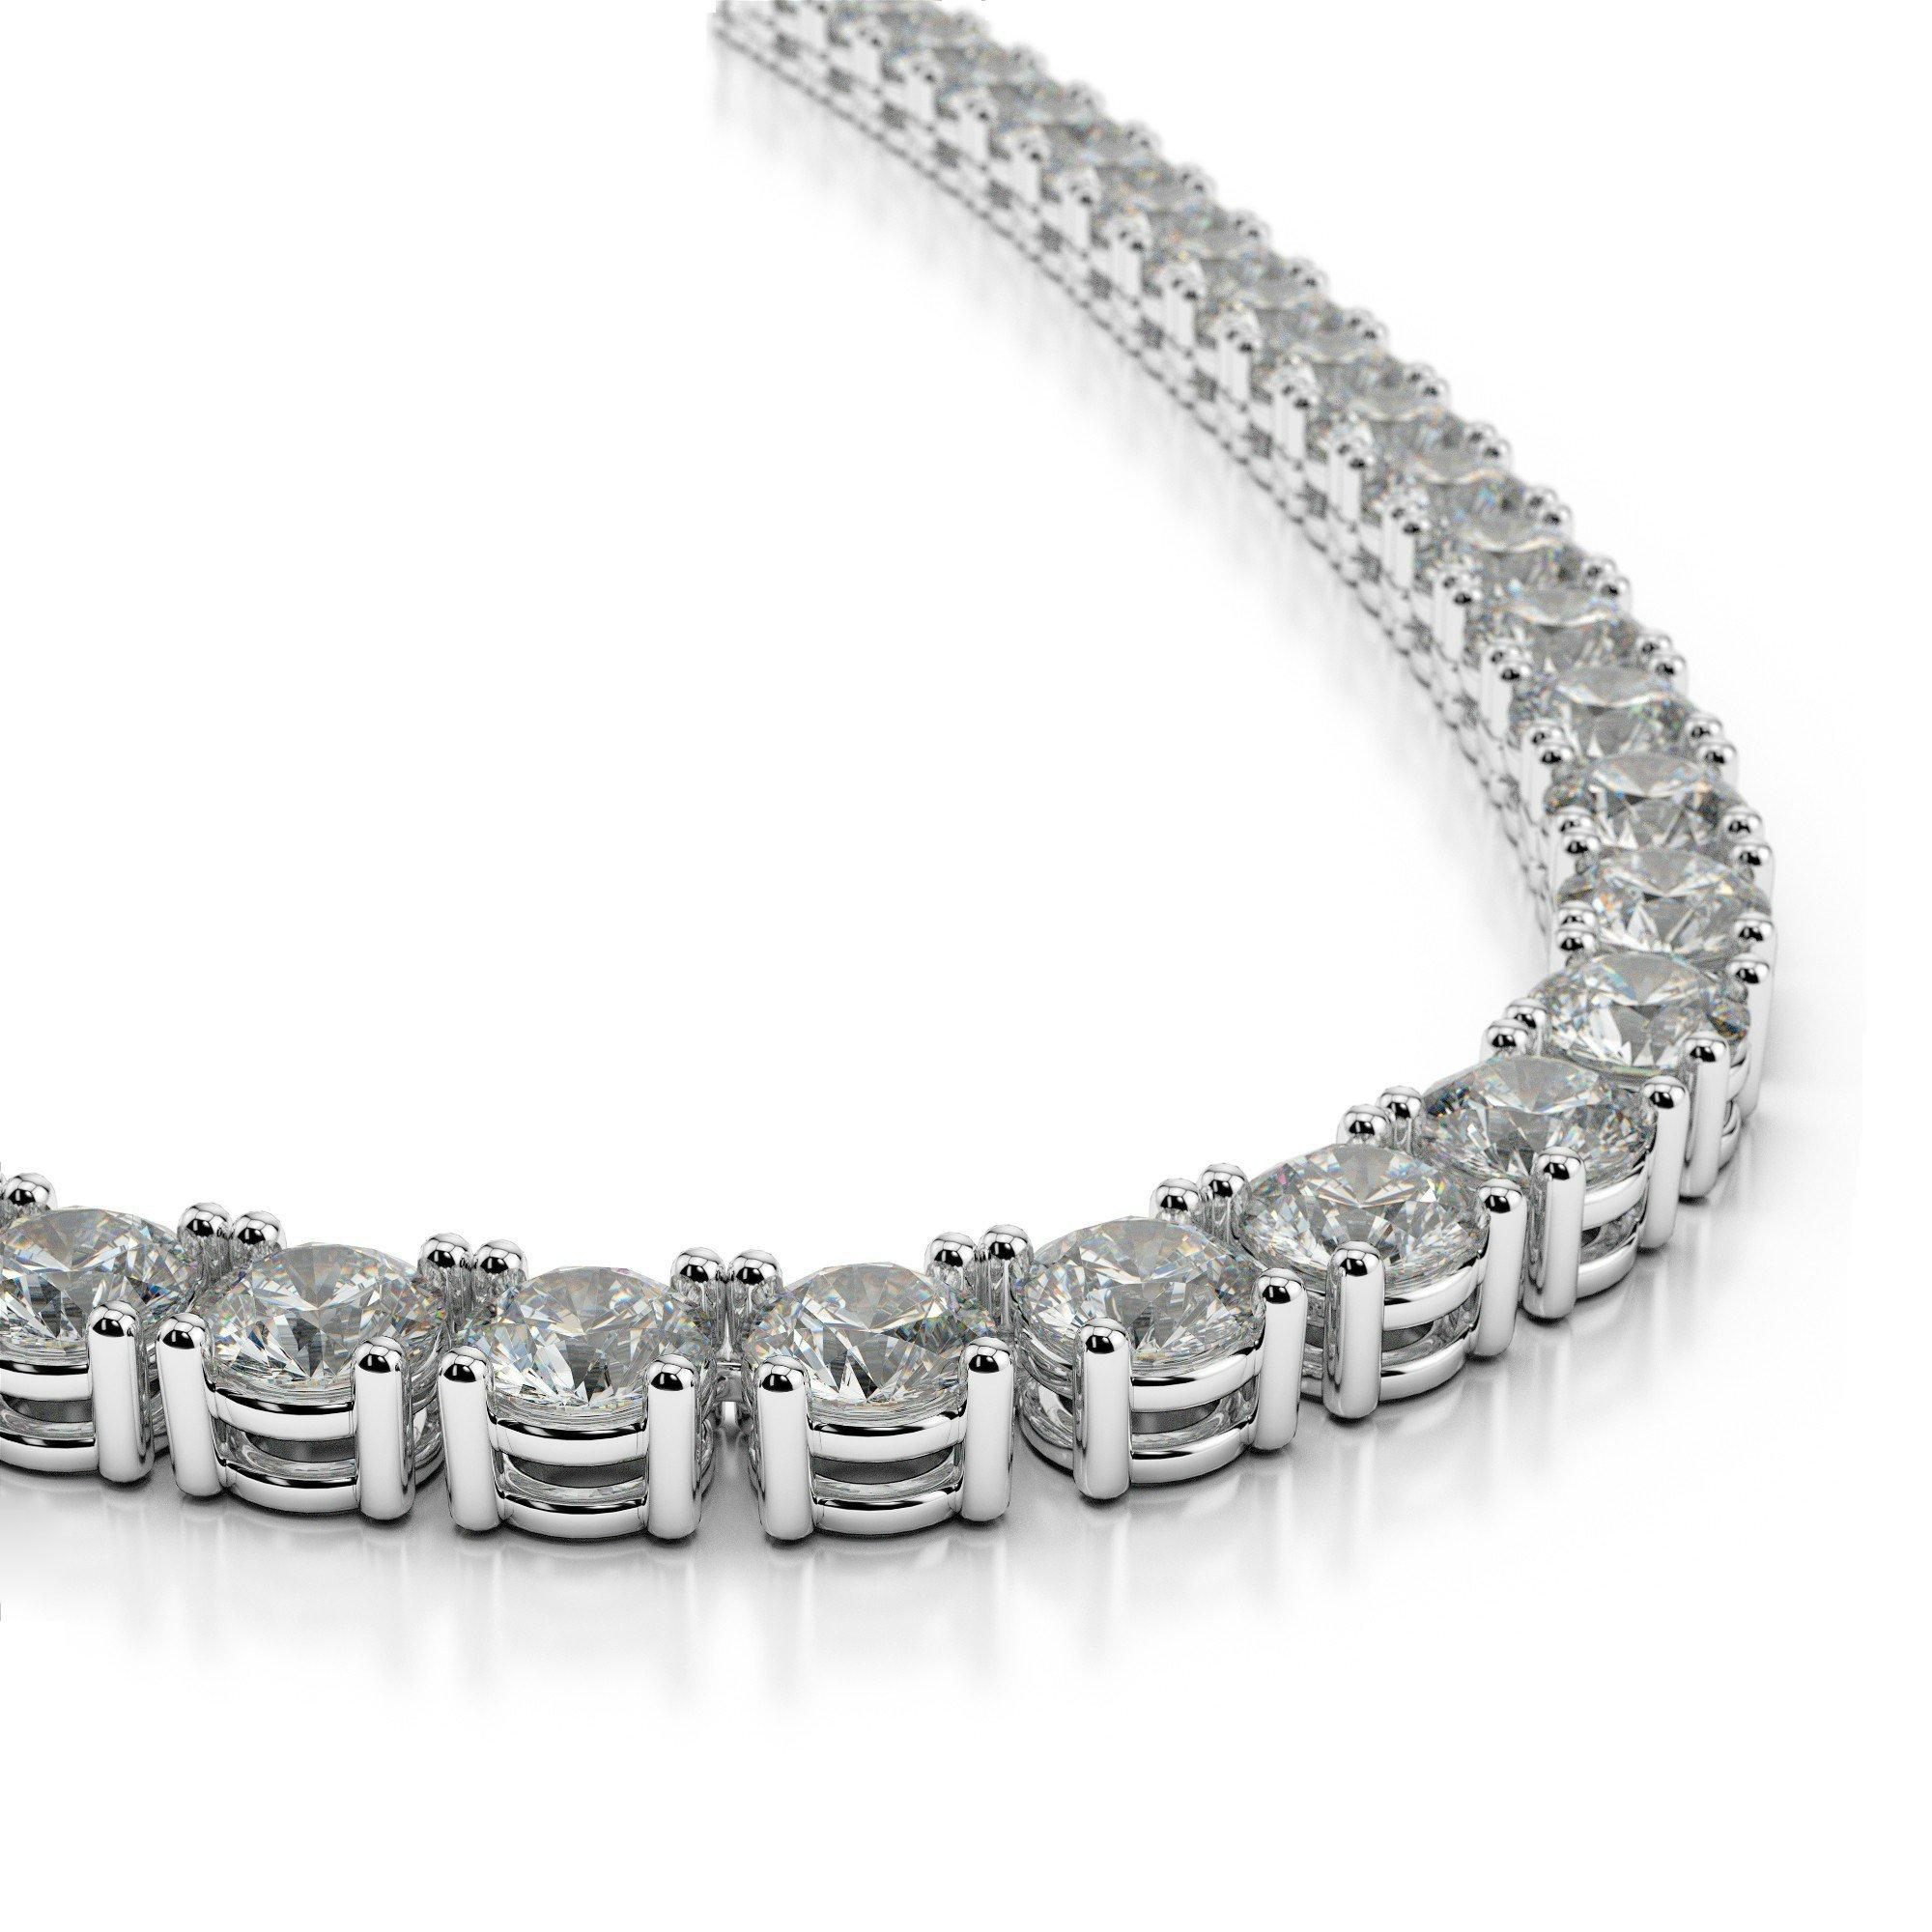 40 Carat Old European Cut Harro Moissanite Tennis Necklace